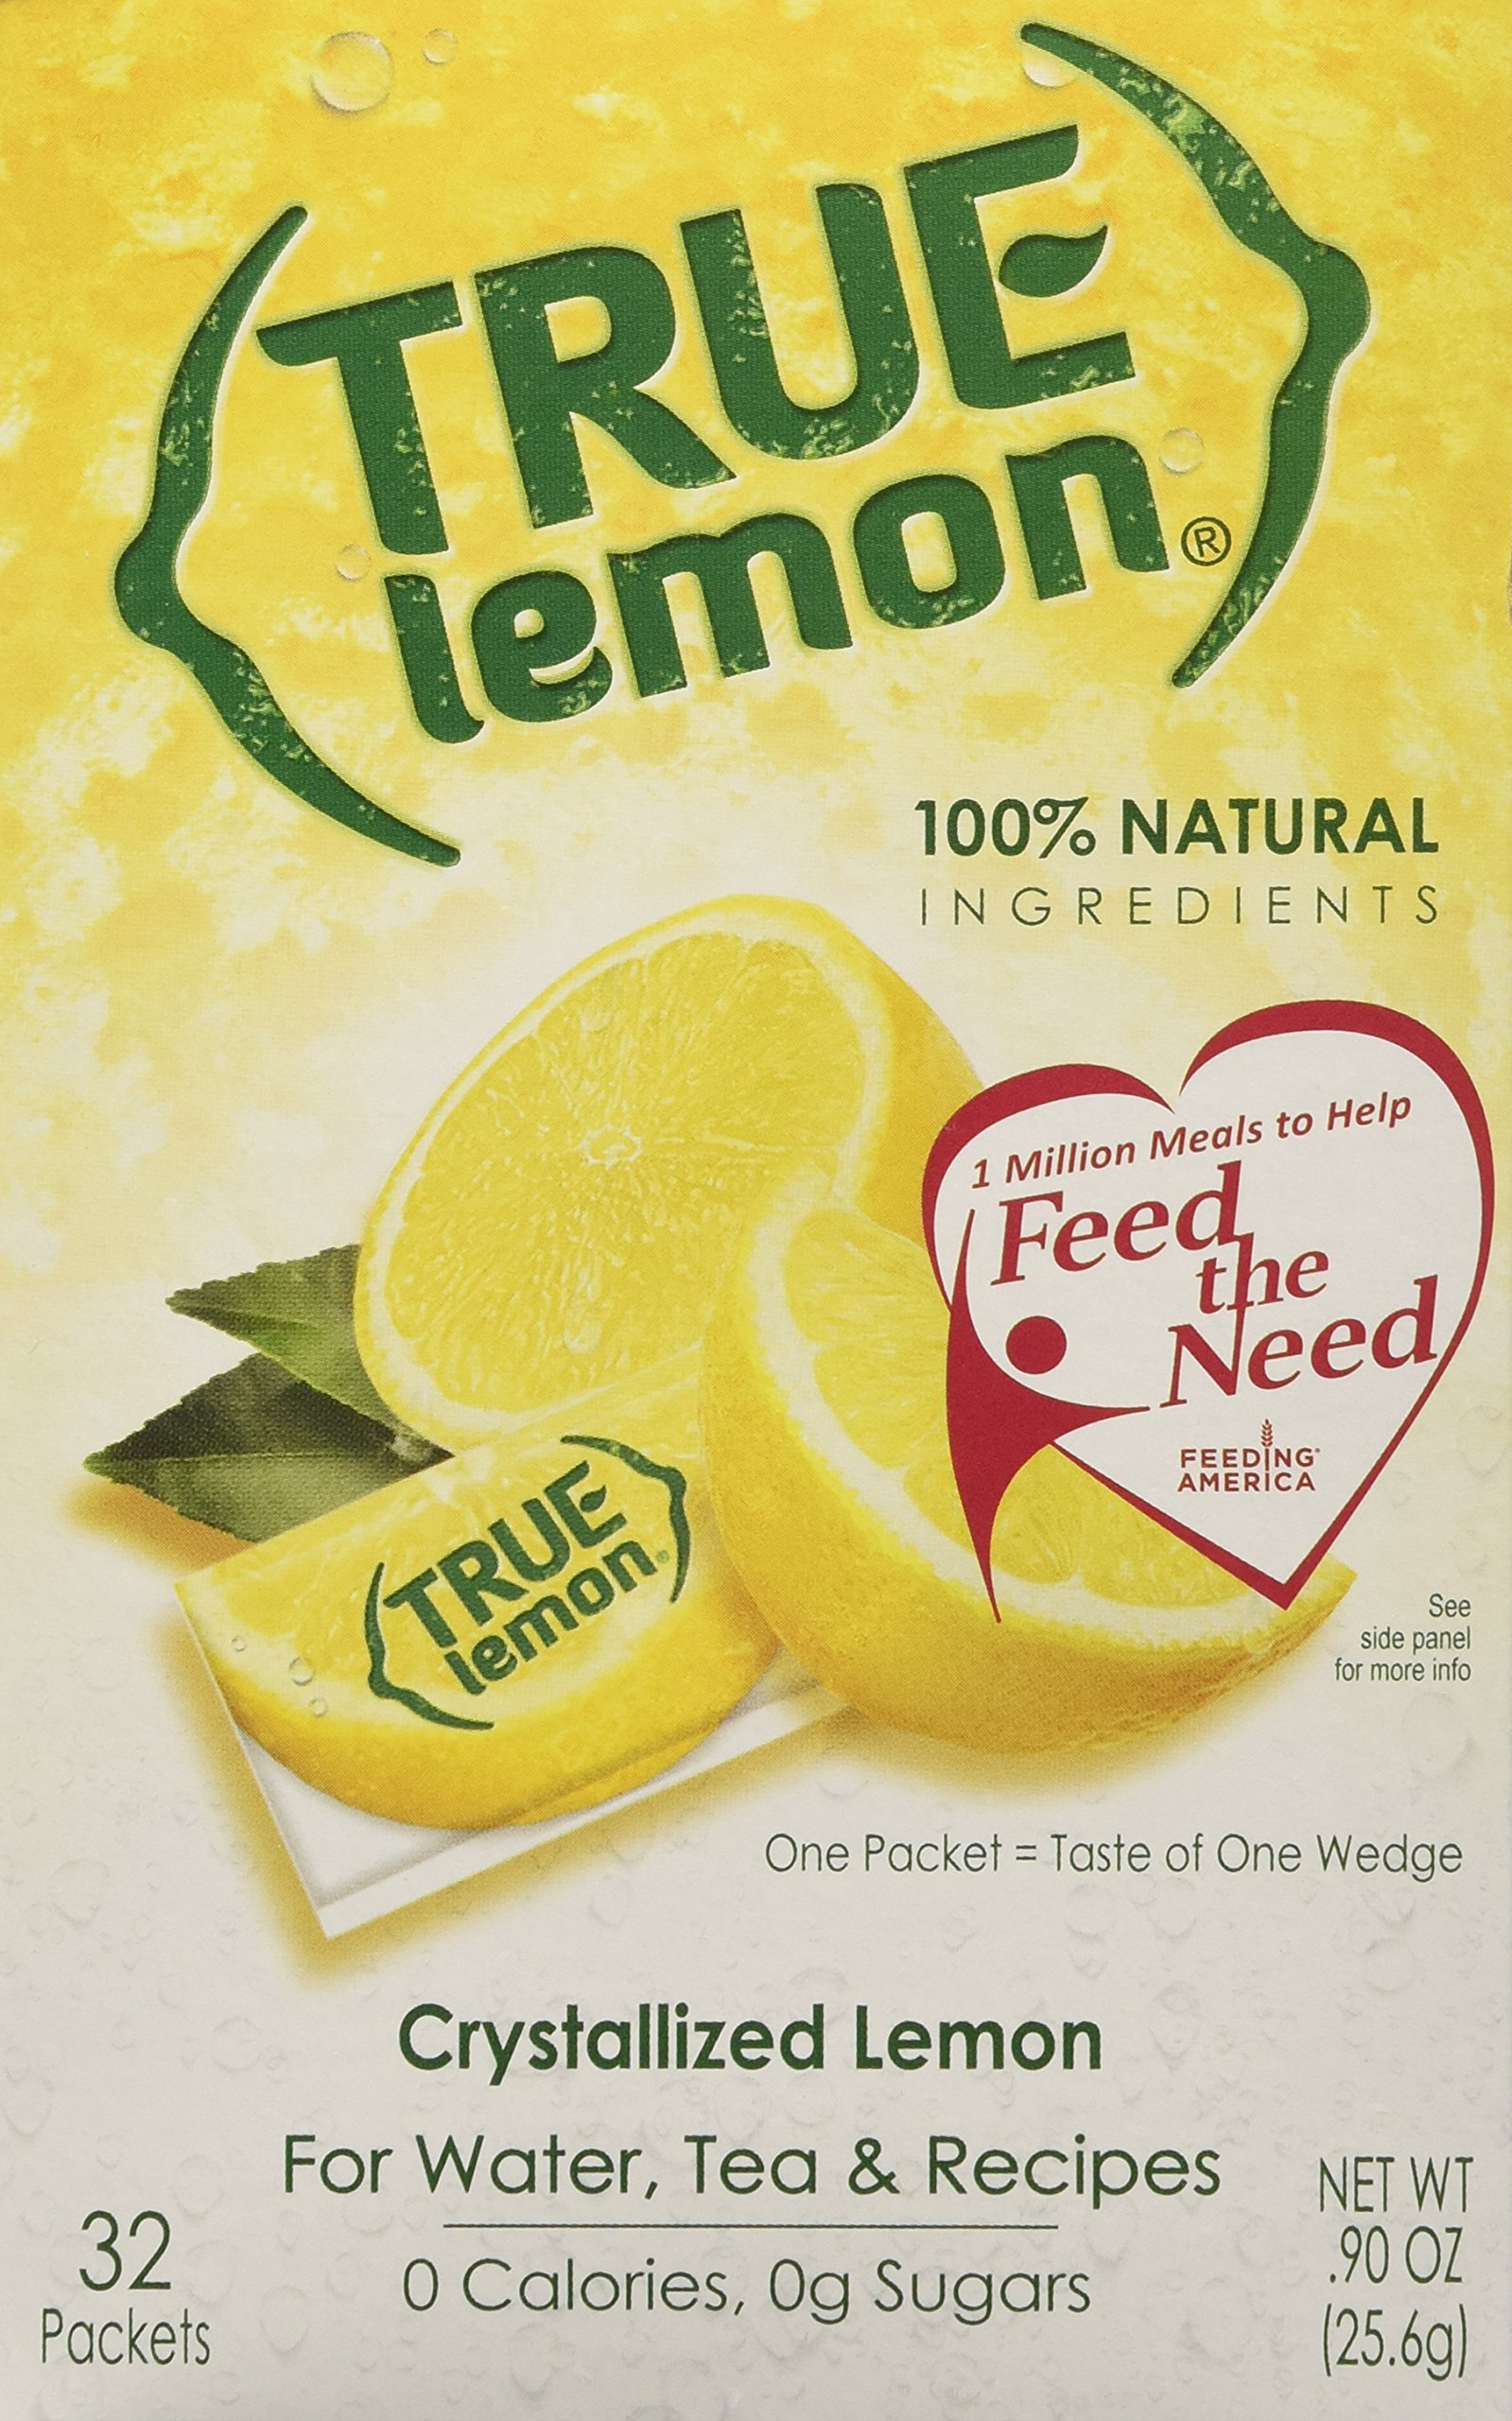 True Lemon Crystalized Lemon 32 Packet Box (3 Pack)= 96 Single Packets .90 oz